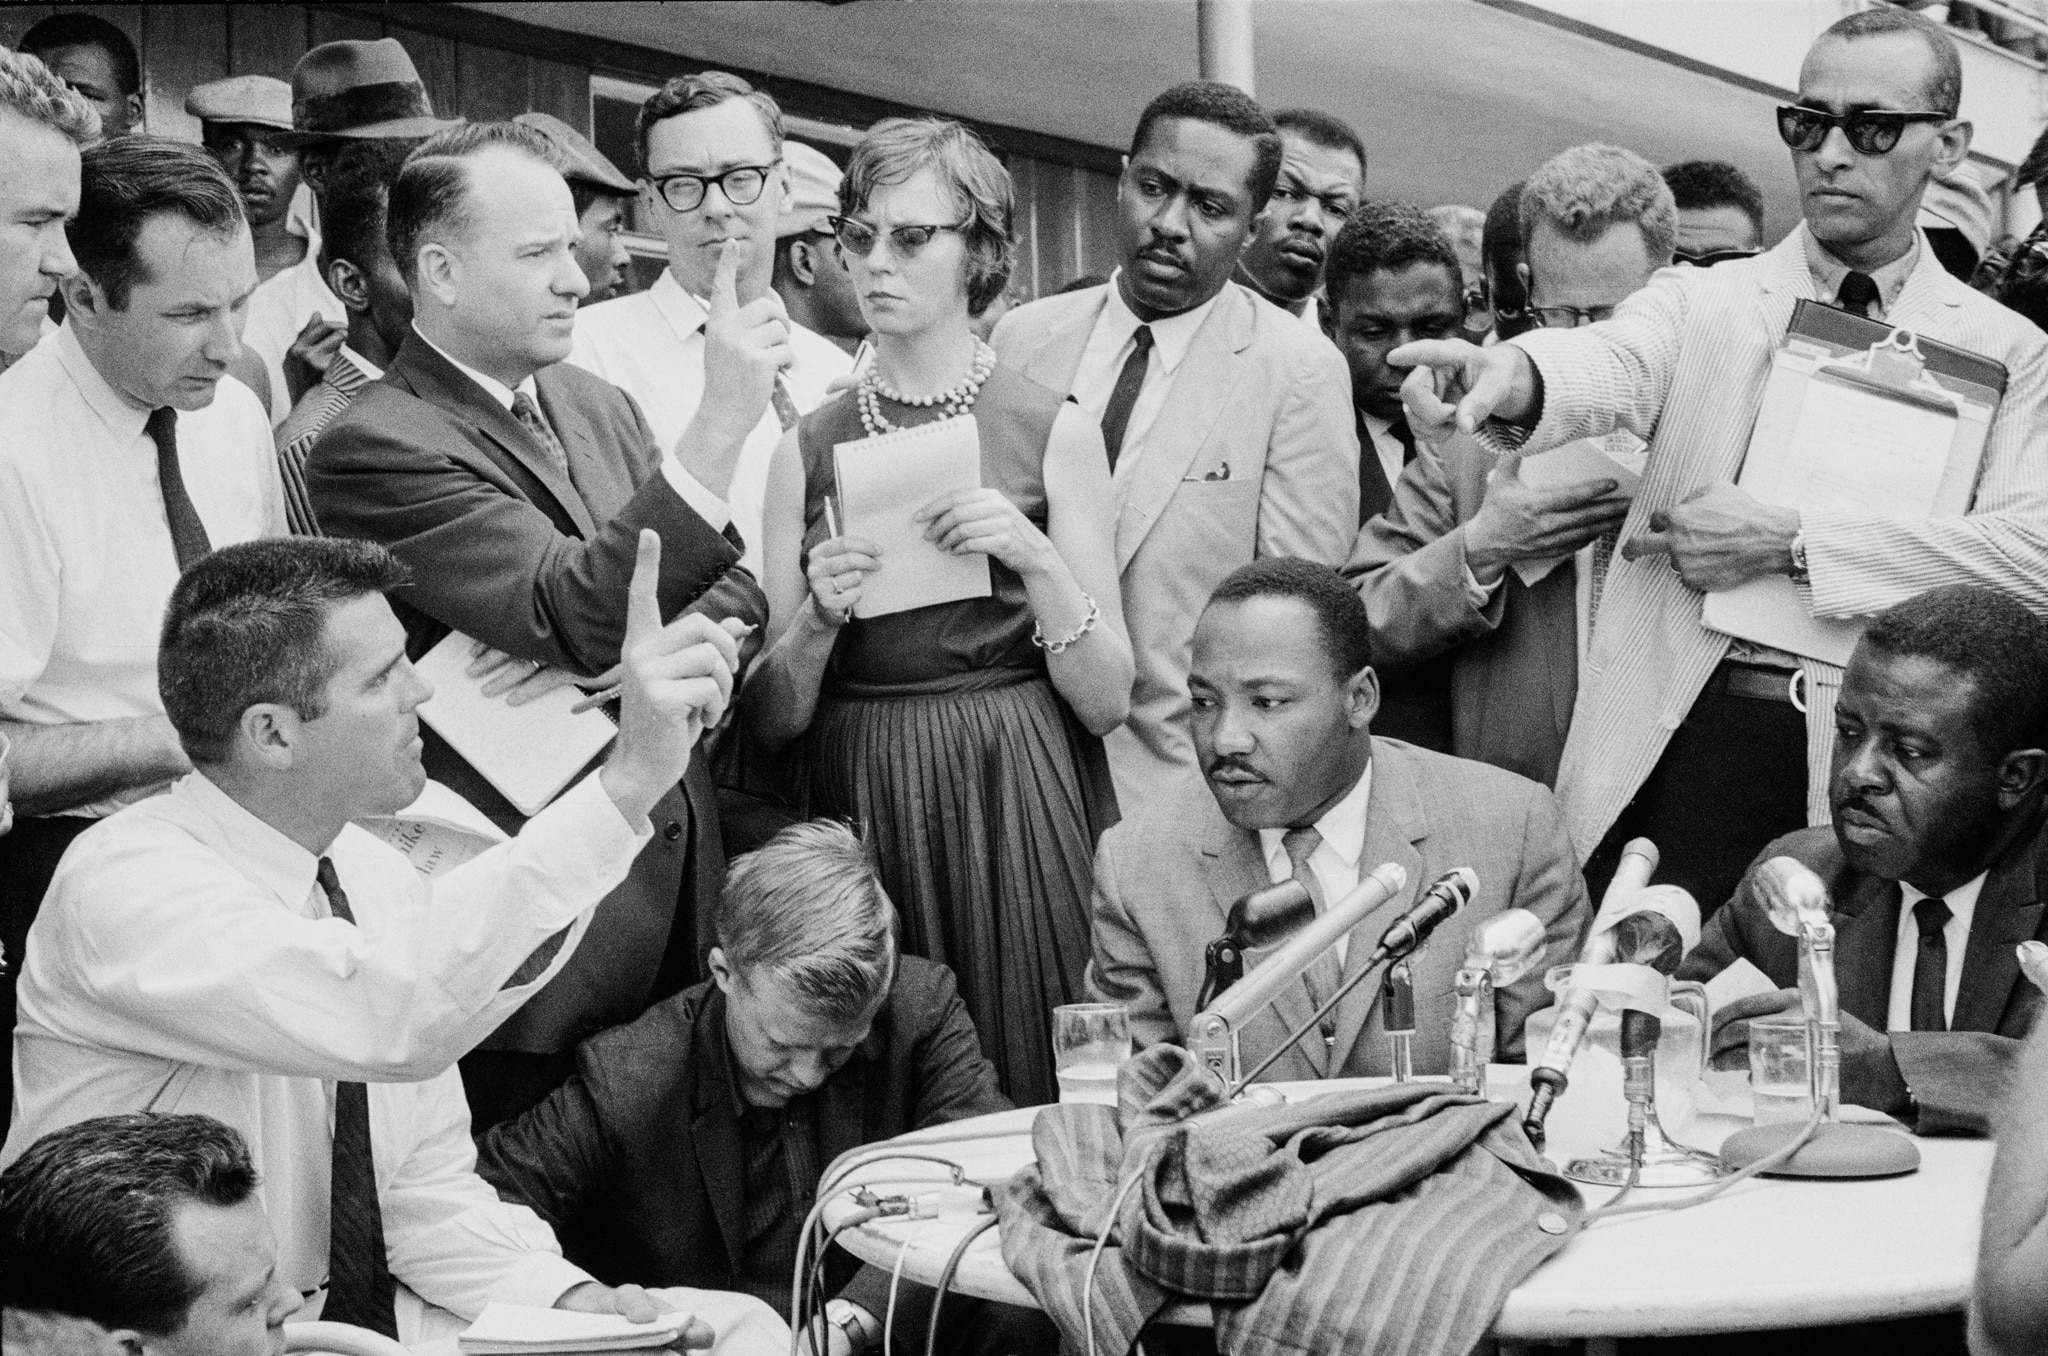 Пресс-конференция Мартина Лютера Кинга (© Ernst Haas/Hulton Archive/Getty Images)